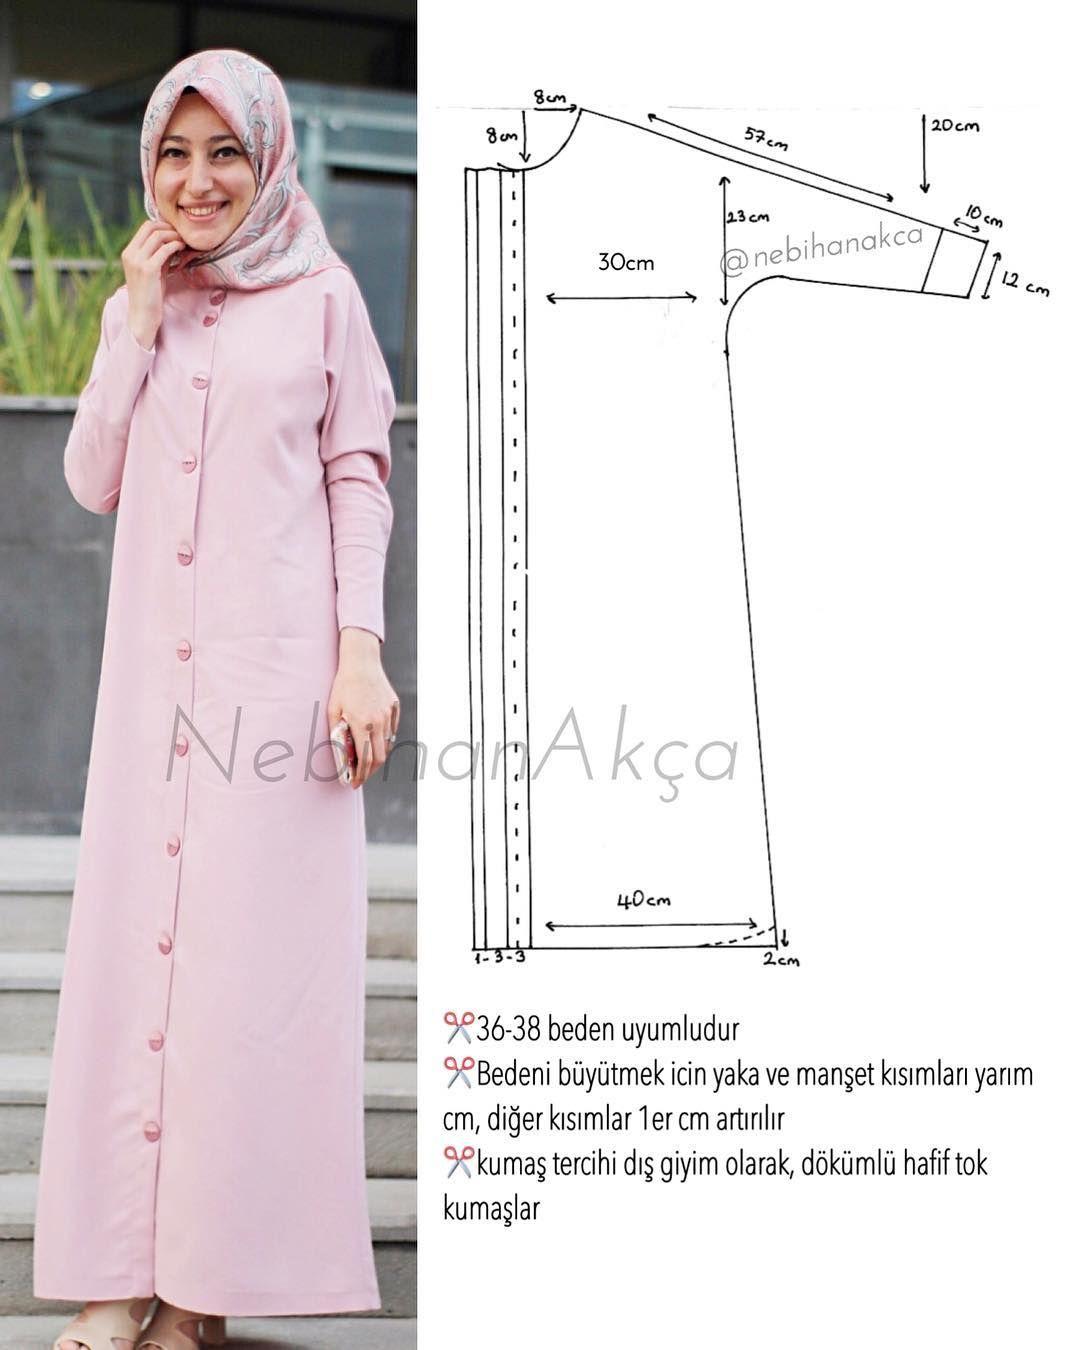 Moda Dikis Giyim Aksesuar Tasarim Tesettur Diy Kombin Hijab Fashion Anne Bebek Kitap Gunluk Kadin Site Moda Dikis Dikis Elbise